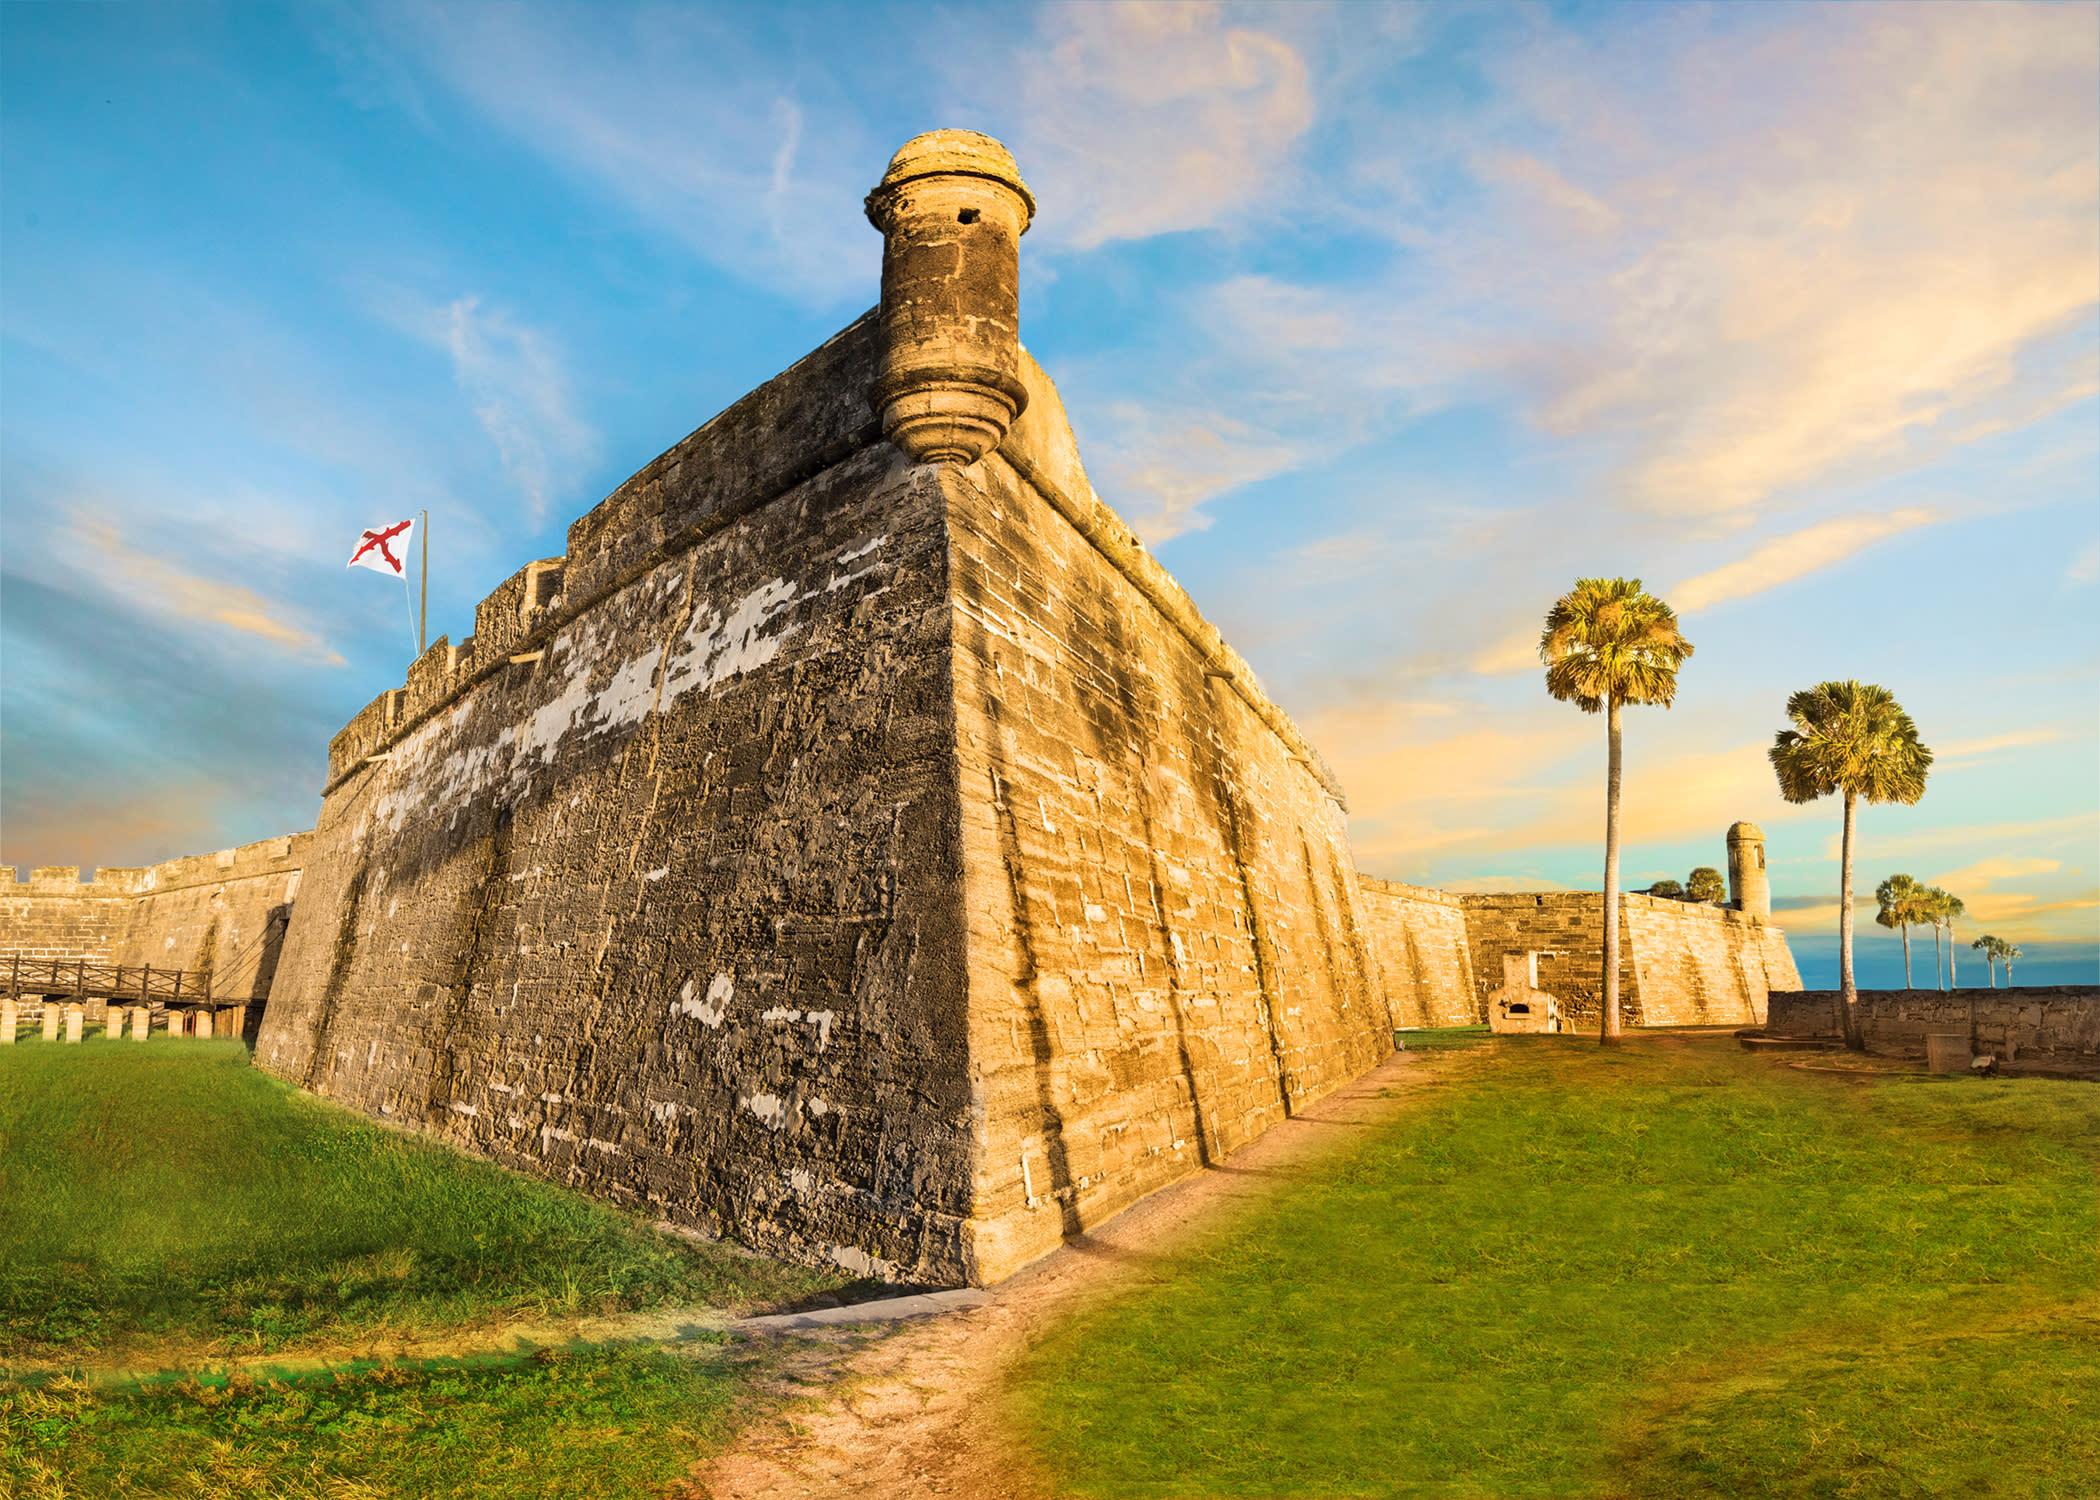 Castillo de San Marcos 17th-century fort St. Augustine nation's oldest city